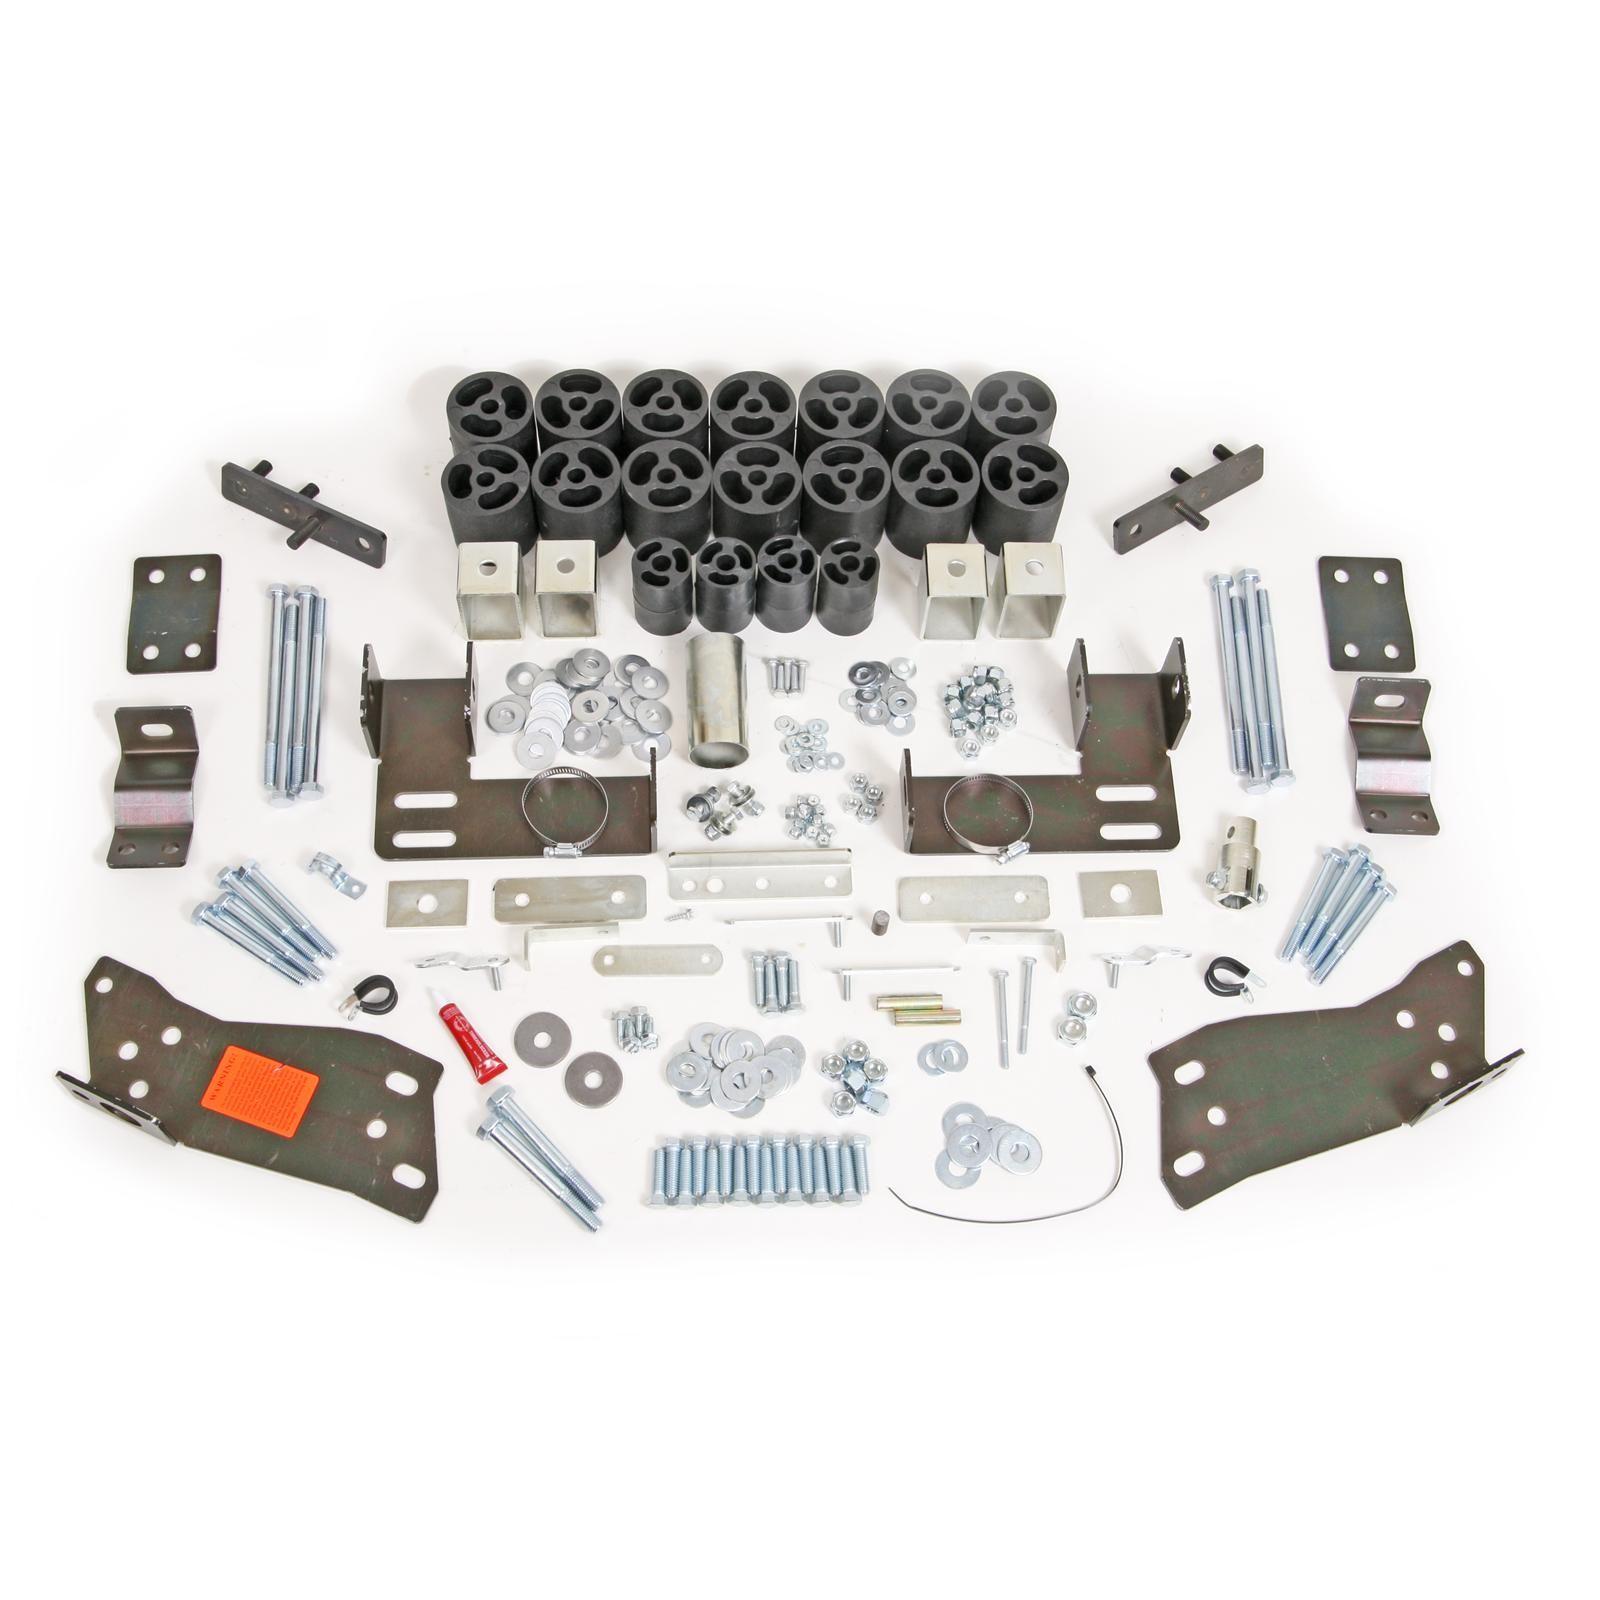 Summit Racing® 3 Inch Body Lift Kits | Car parts | Summit